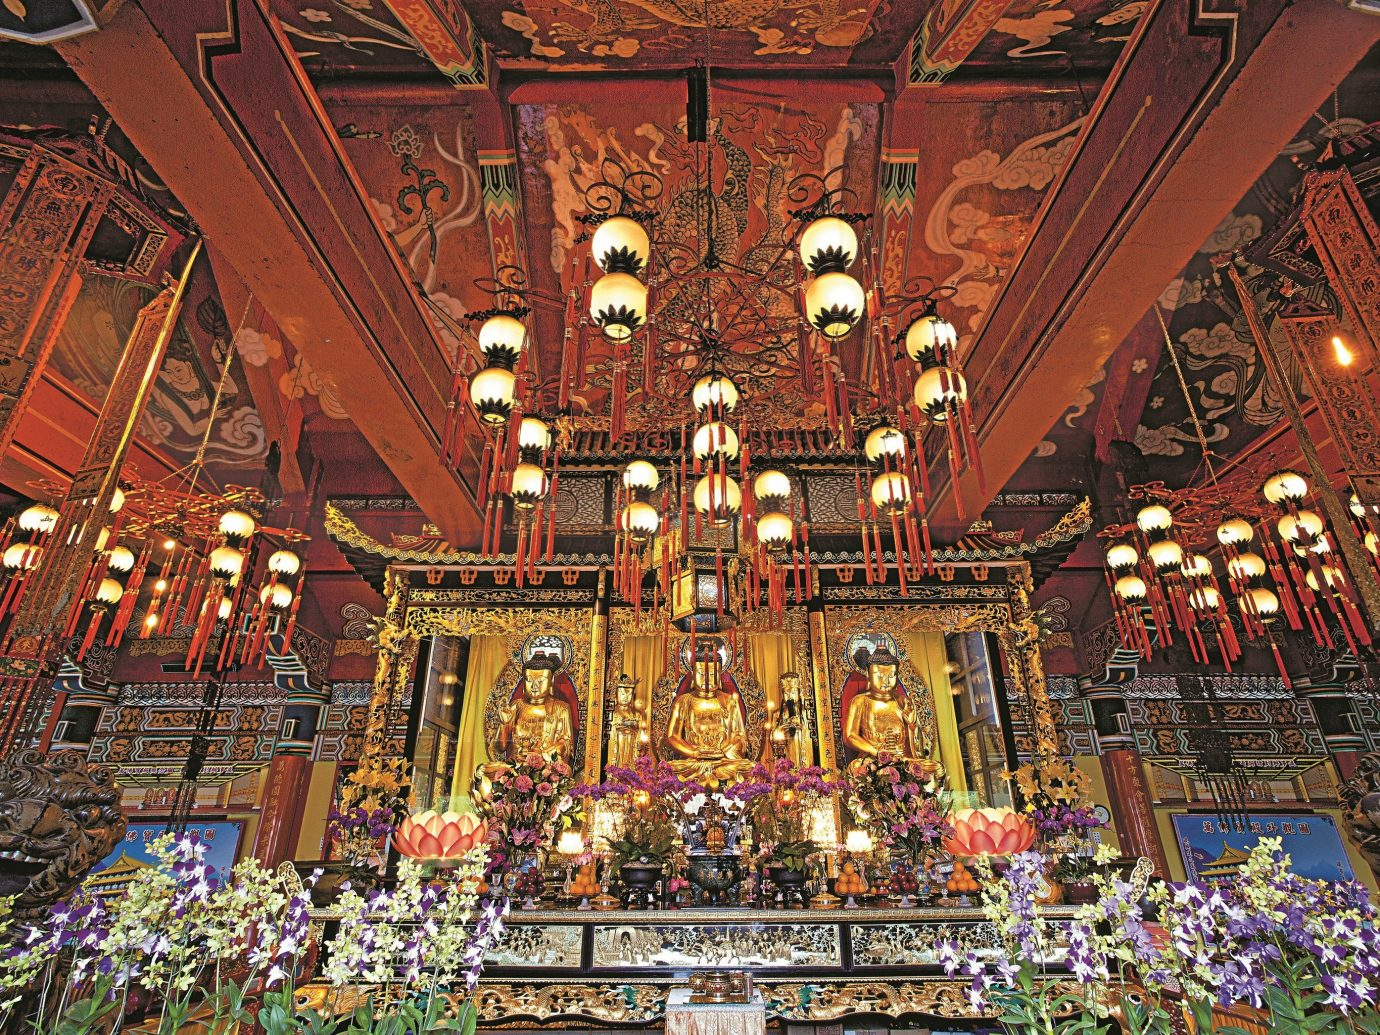 Trip Ideas building place of worship altar shrine temple